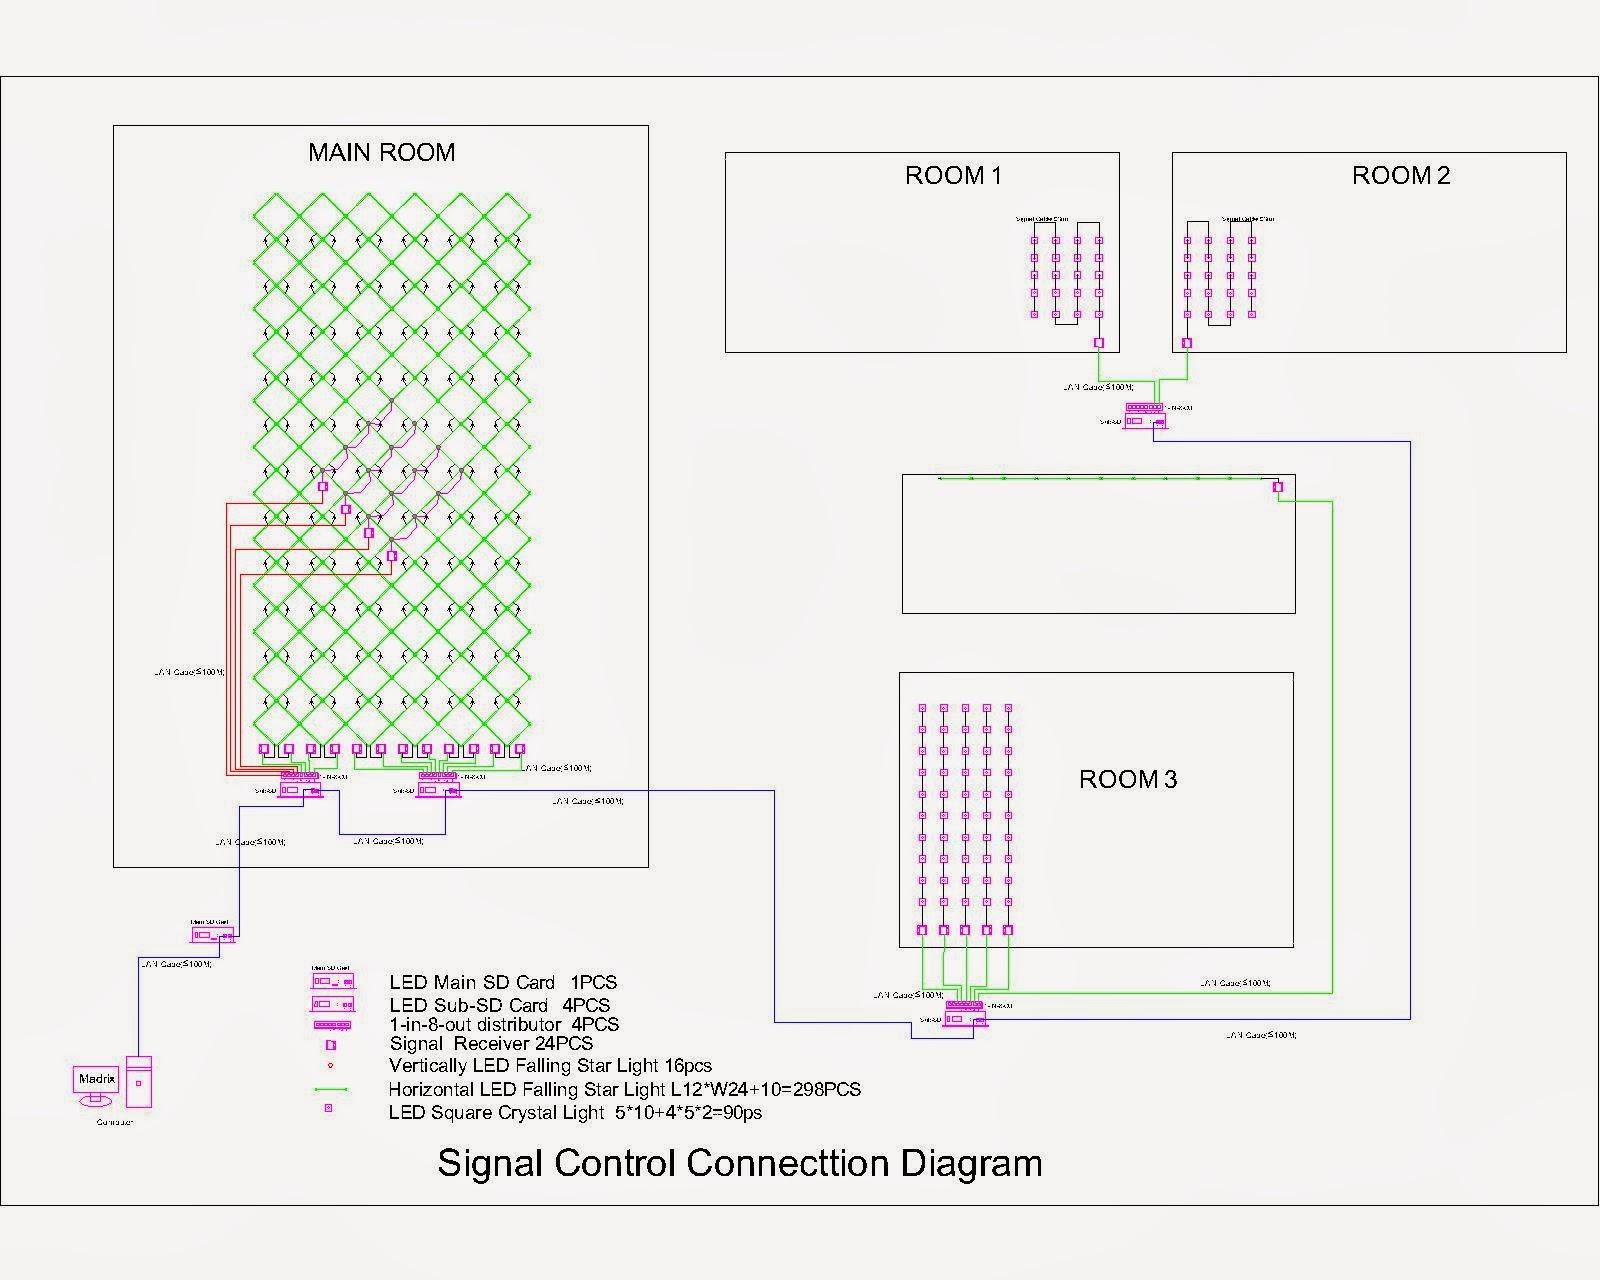 Klubb Gota Stockholm Wiring Diagram As Well Dmx Led Controller Cat 5 Dvi Signal